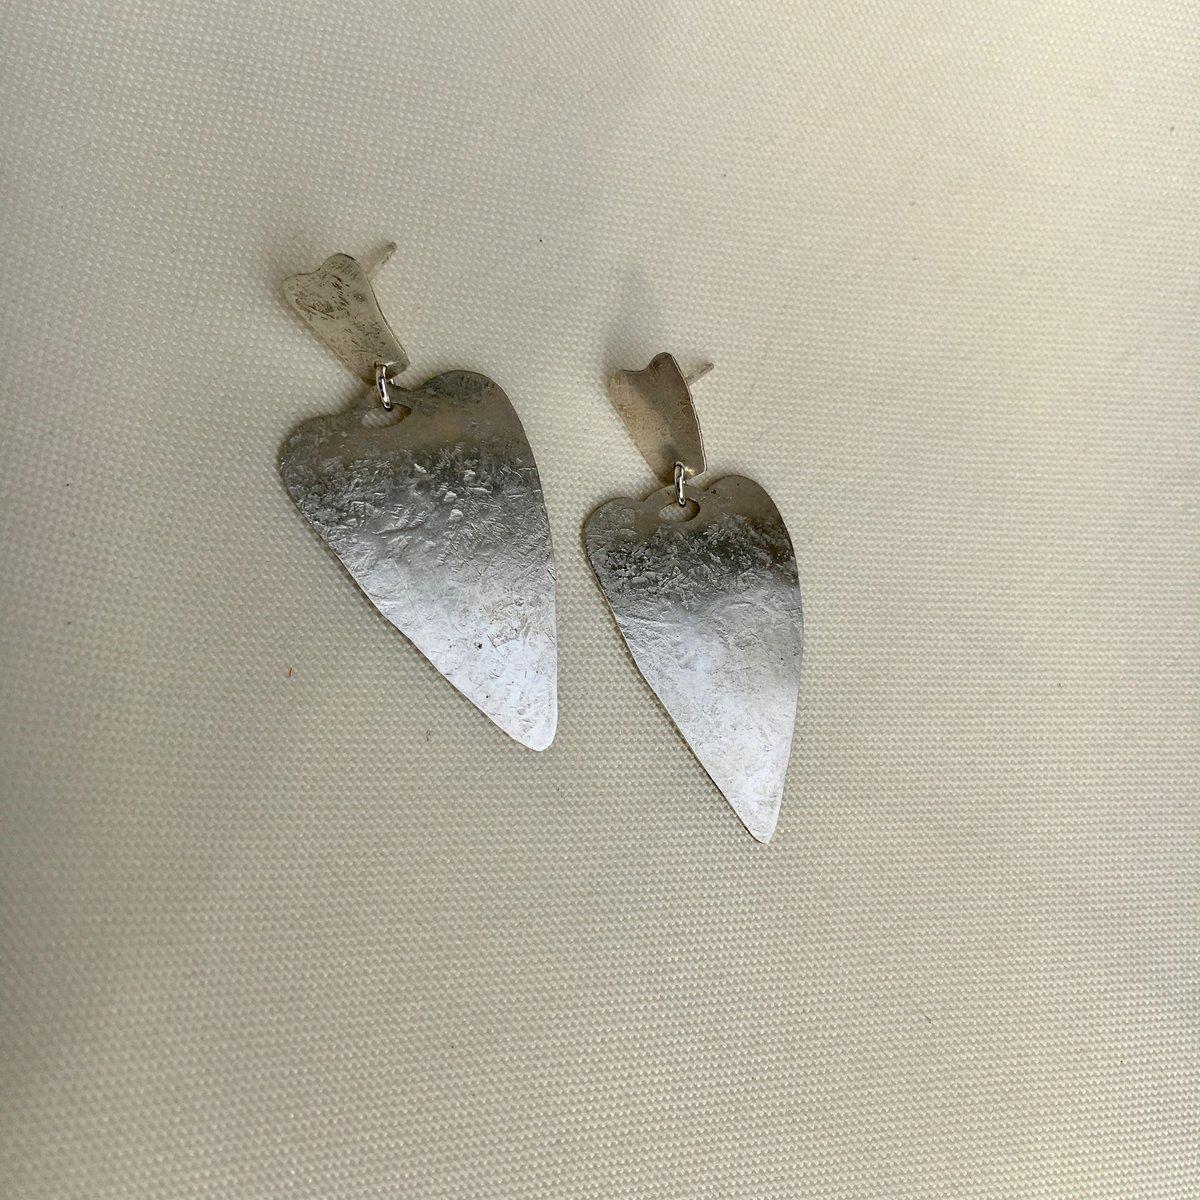 Image of spade earring